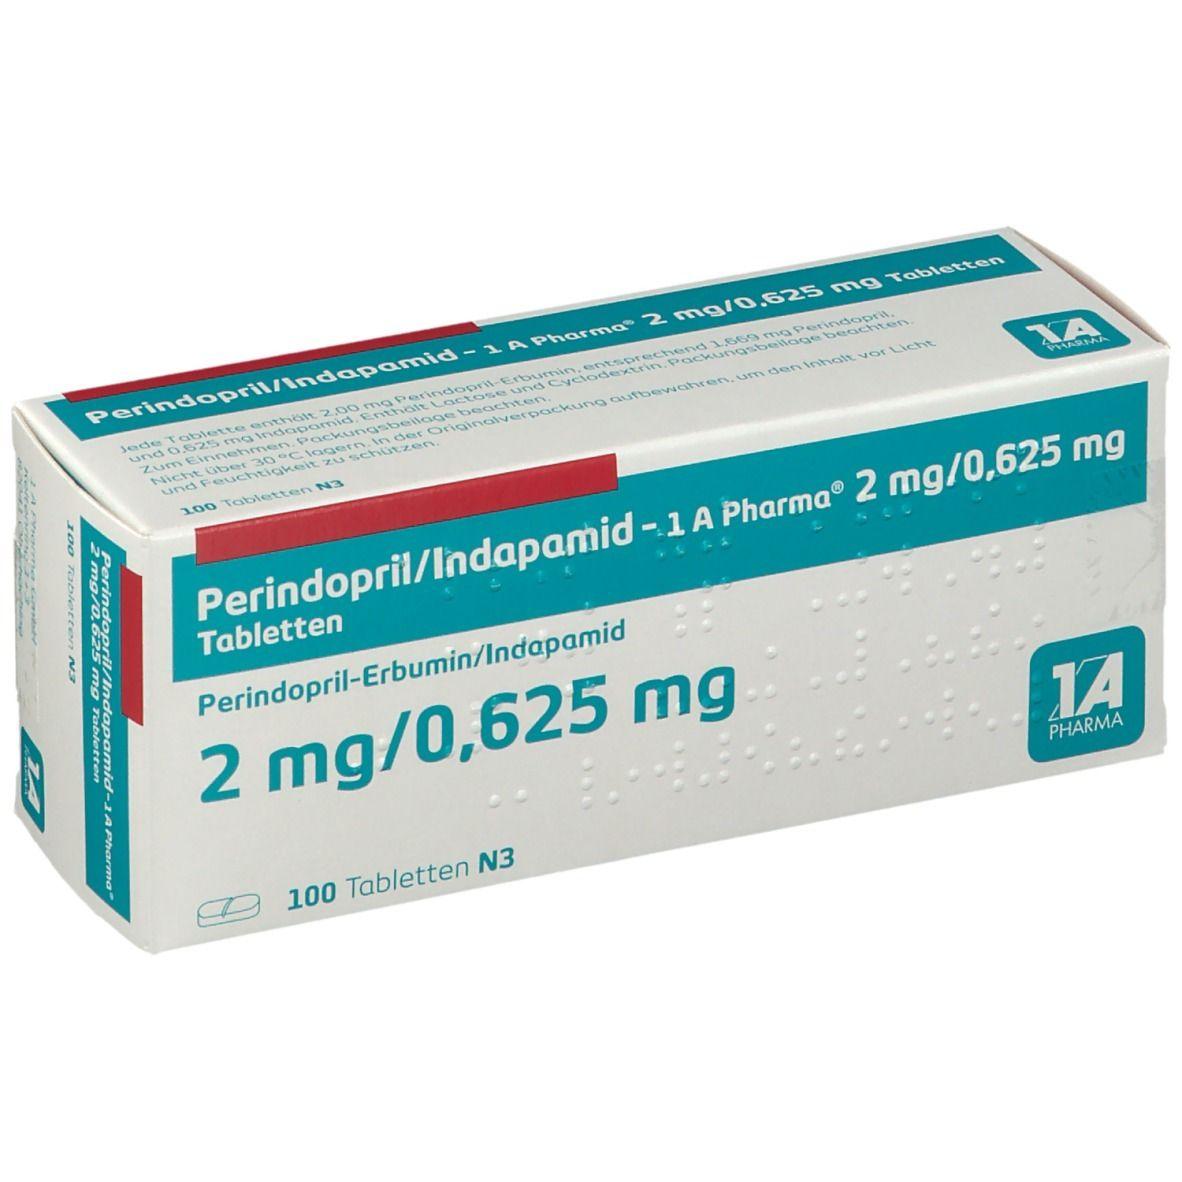 Perindopril/Indapamid   22020 A Pharma® 220 mg/20,62205 mg 220202020 St   shop ...